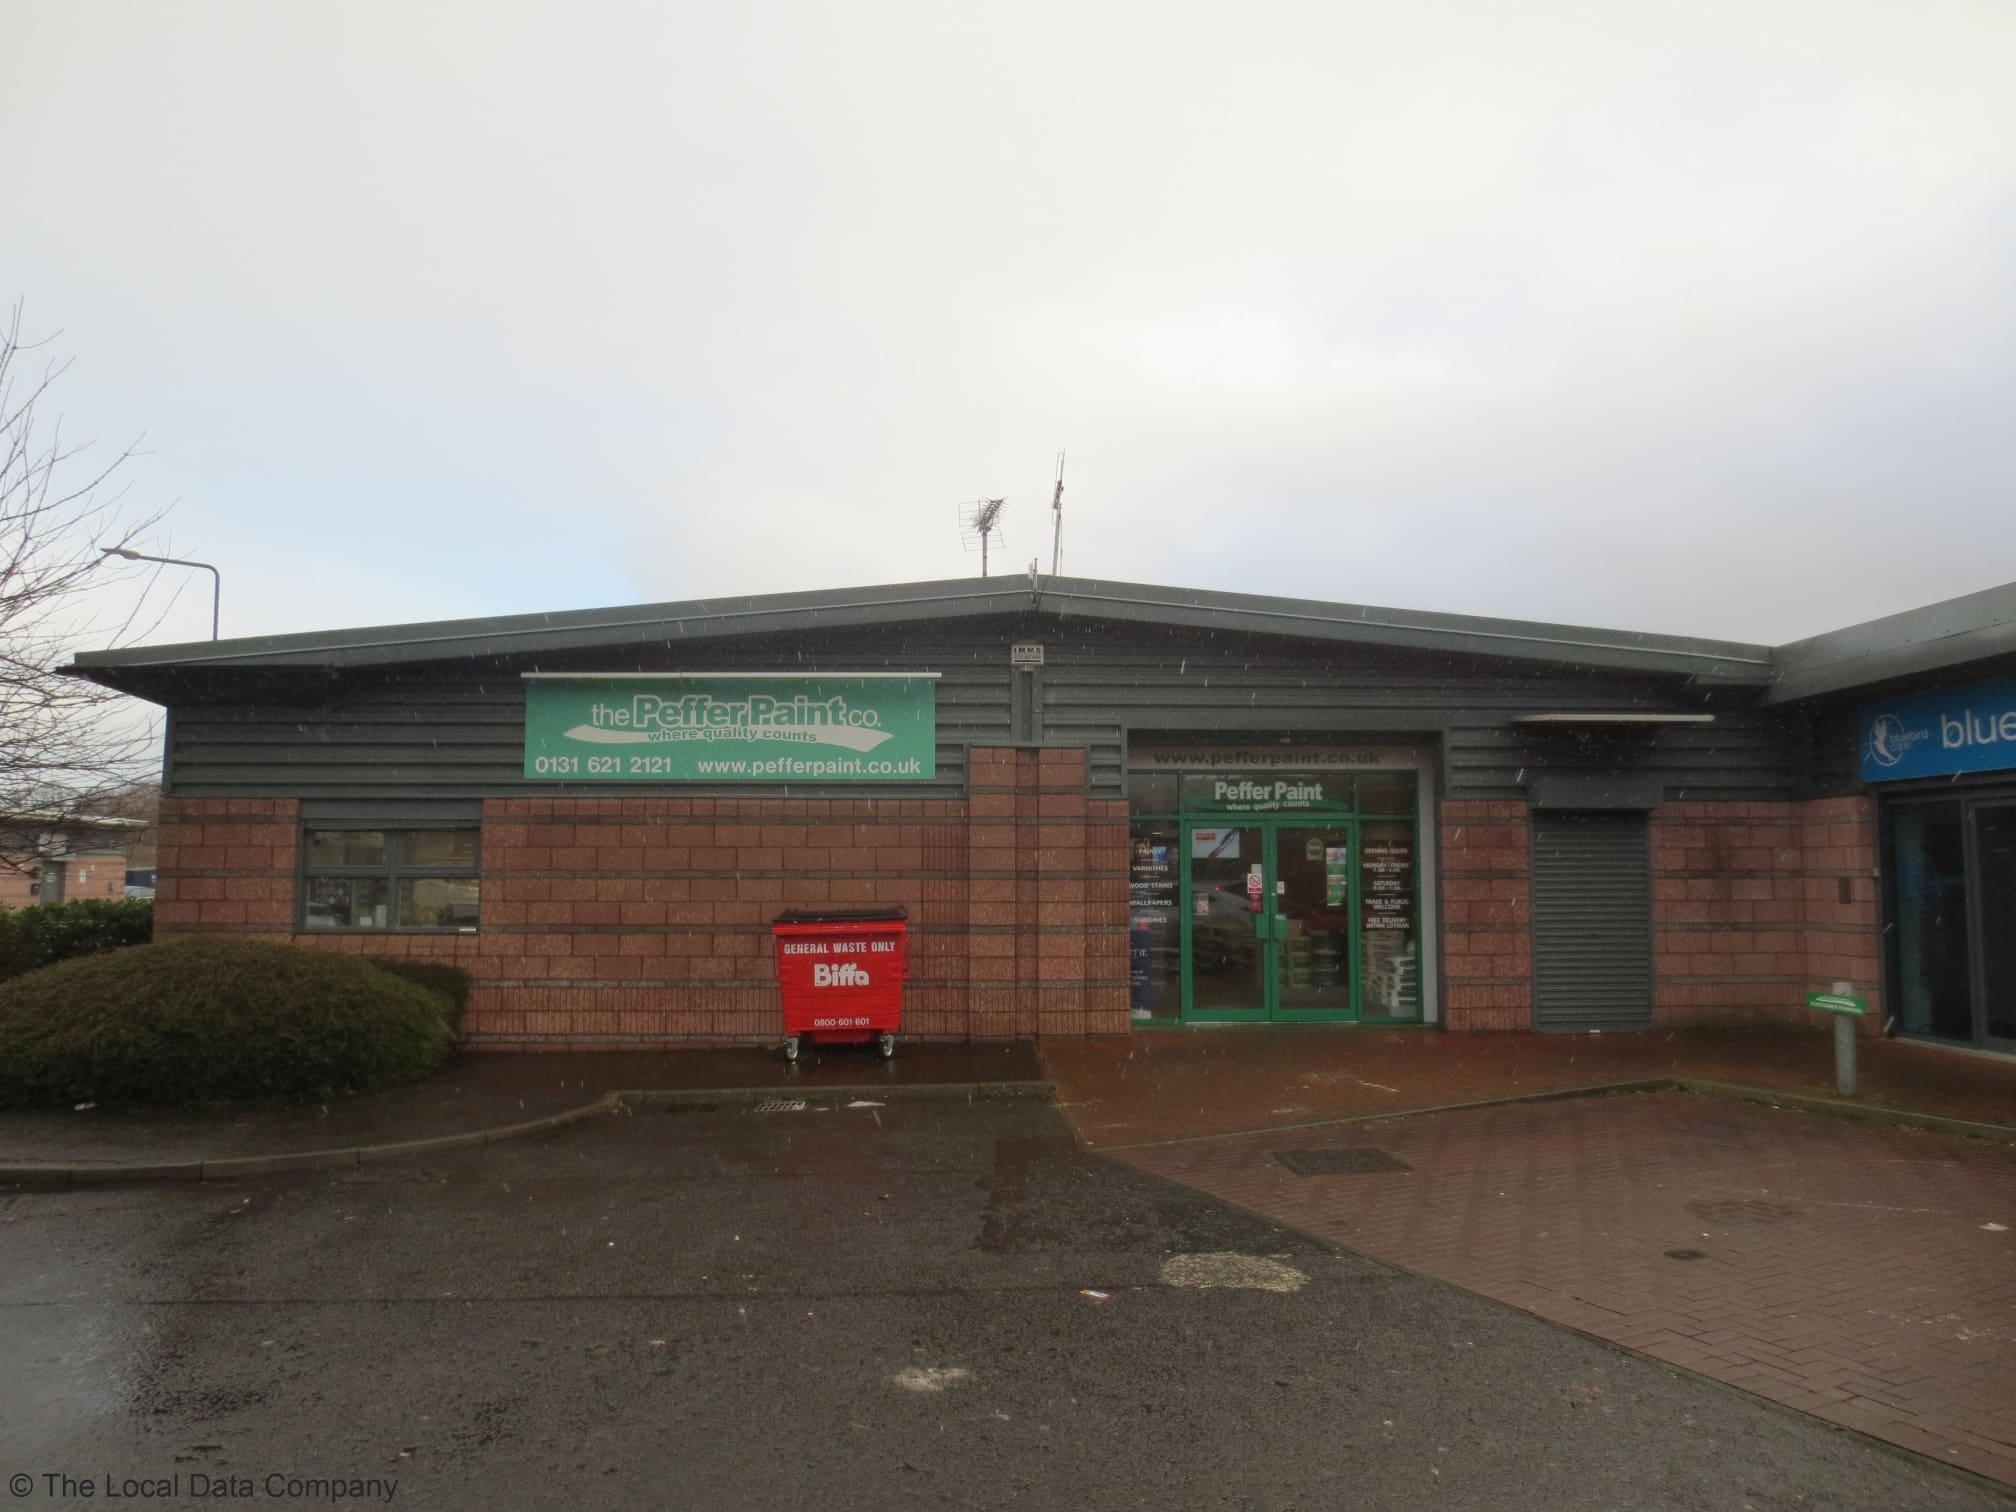 Johnstones Leyland Decorating Centre | 75 Peffer Place, Edinburgh EH16 4BB | +44 131 621 2121